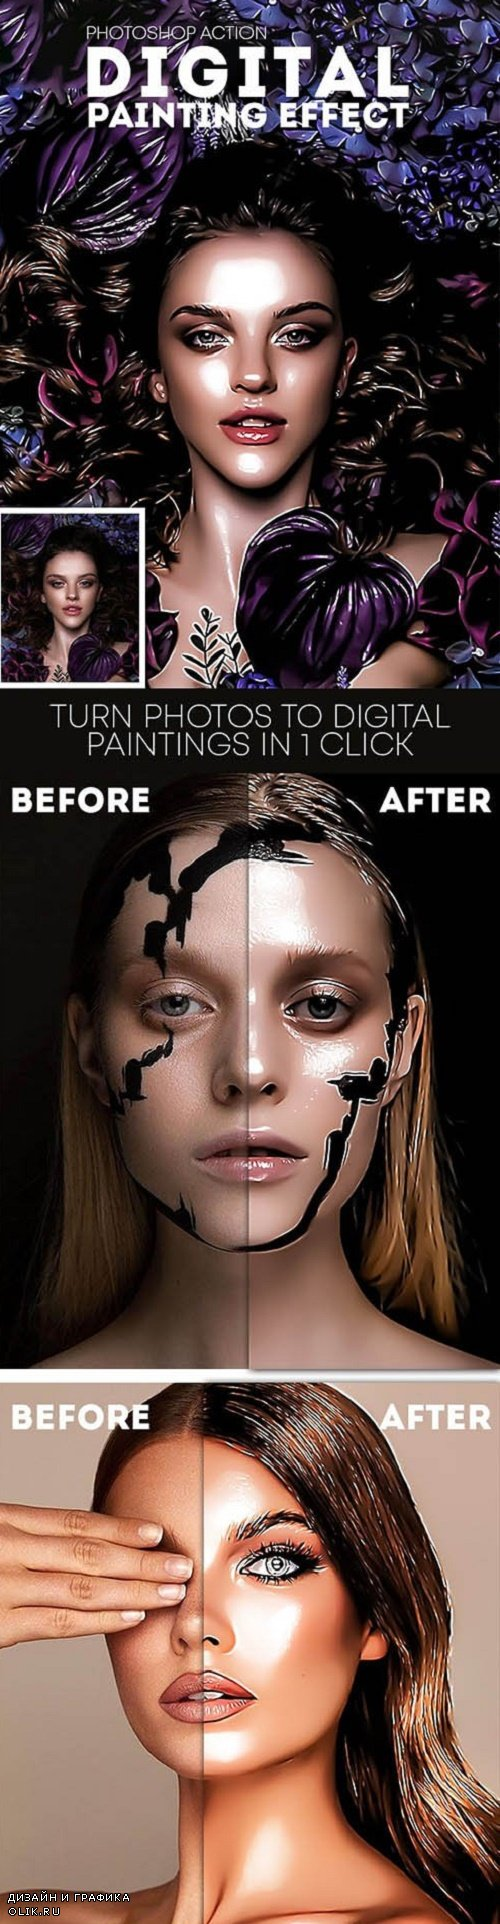 Digital Painting Effect 24207105